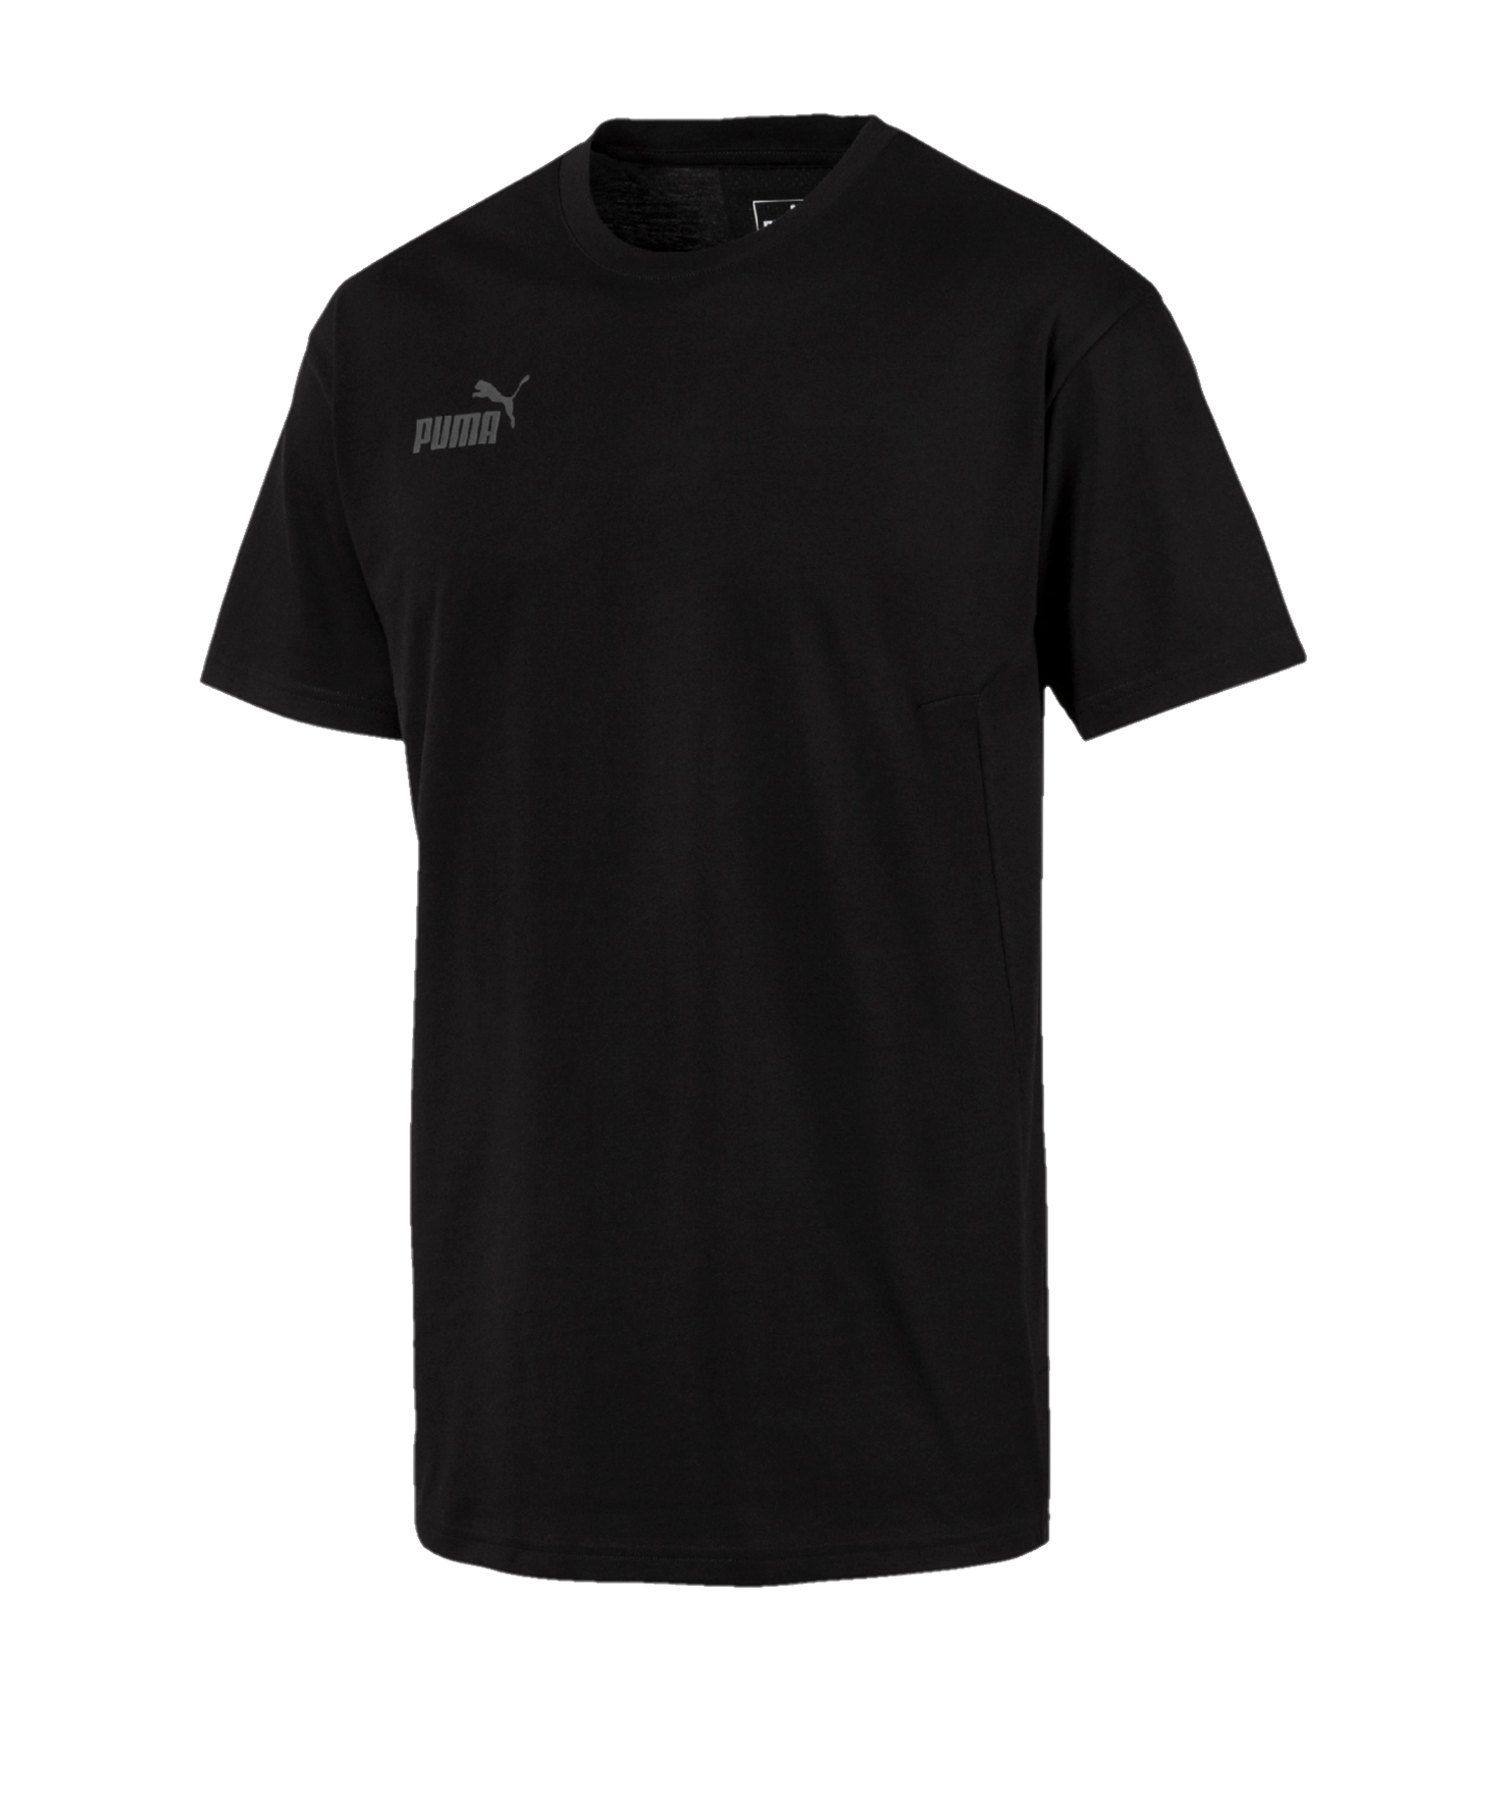 PUMA ftblNXT Casuals T-Shirt Schwarz F03 - schwarz